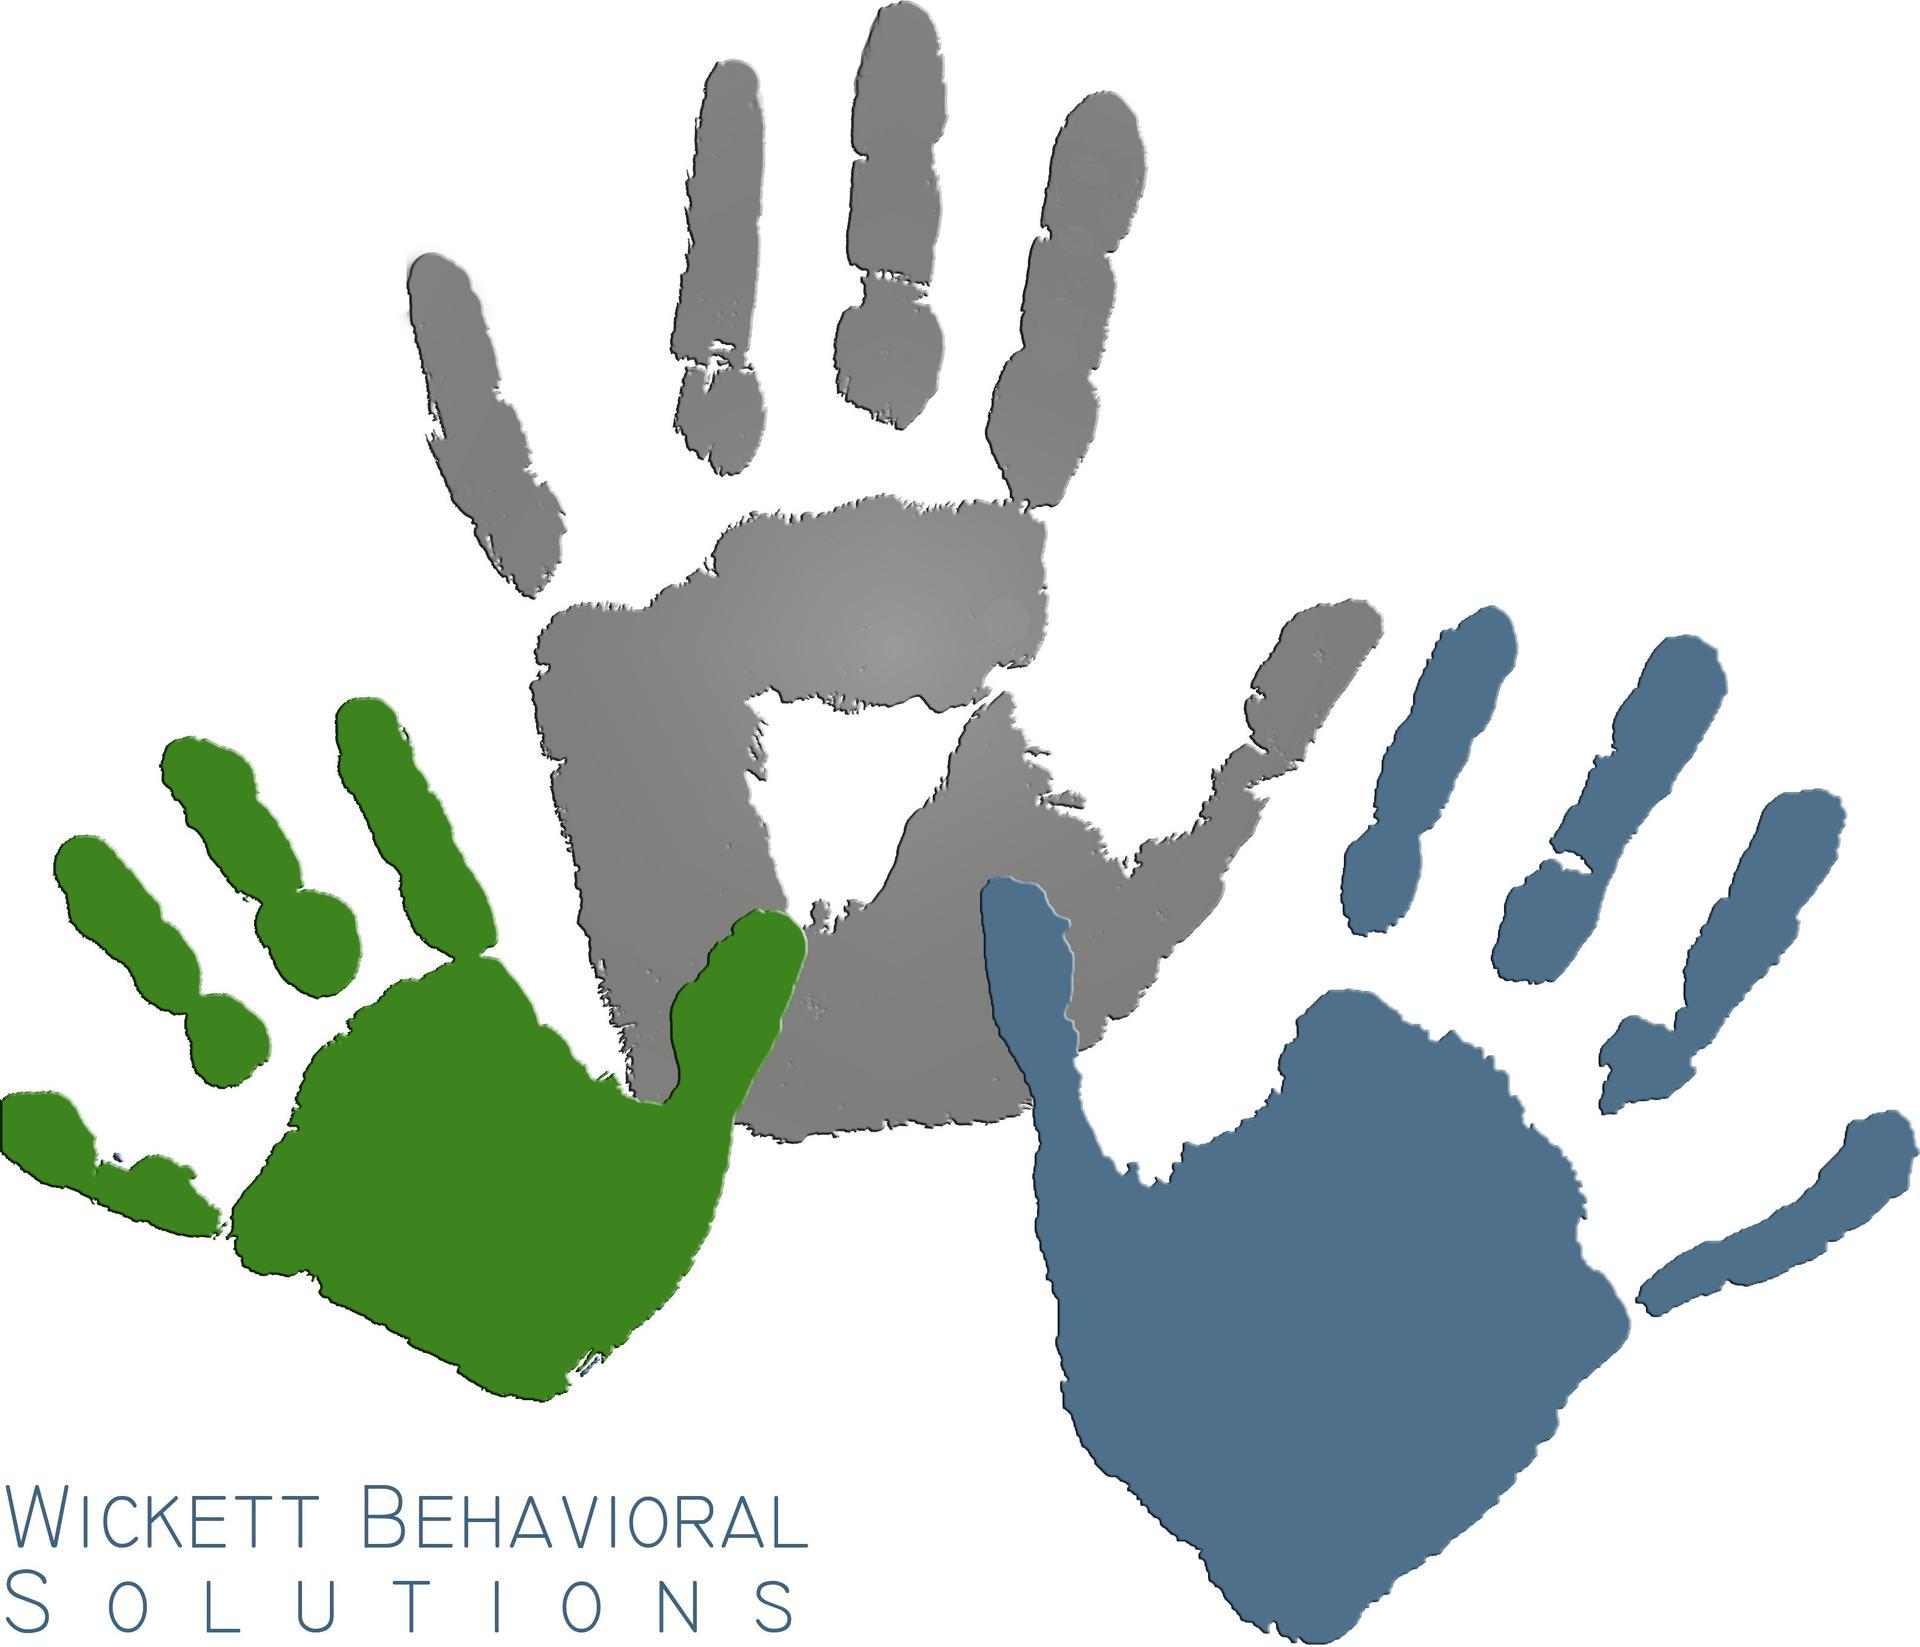 Wickett Behavioral Solutions